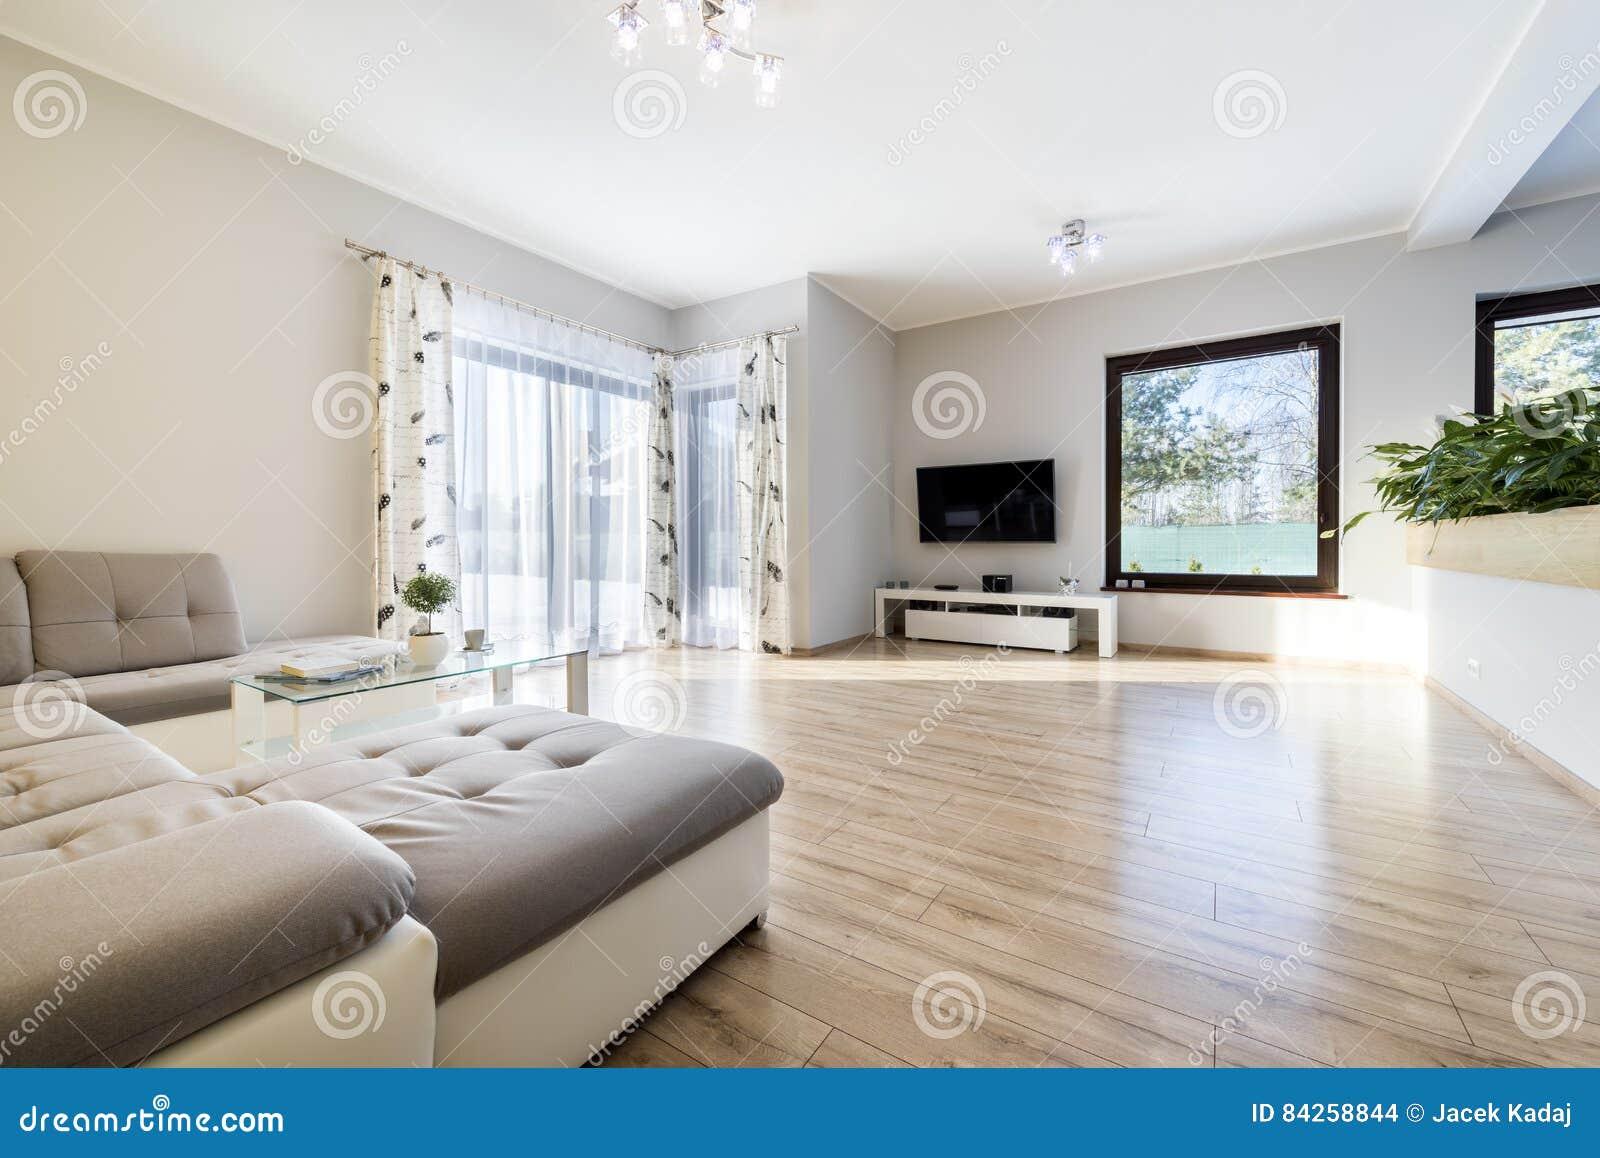 Pavimenti da interno moderni finest finiture casa - Pavimento interno moderno ...